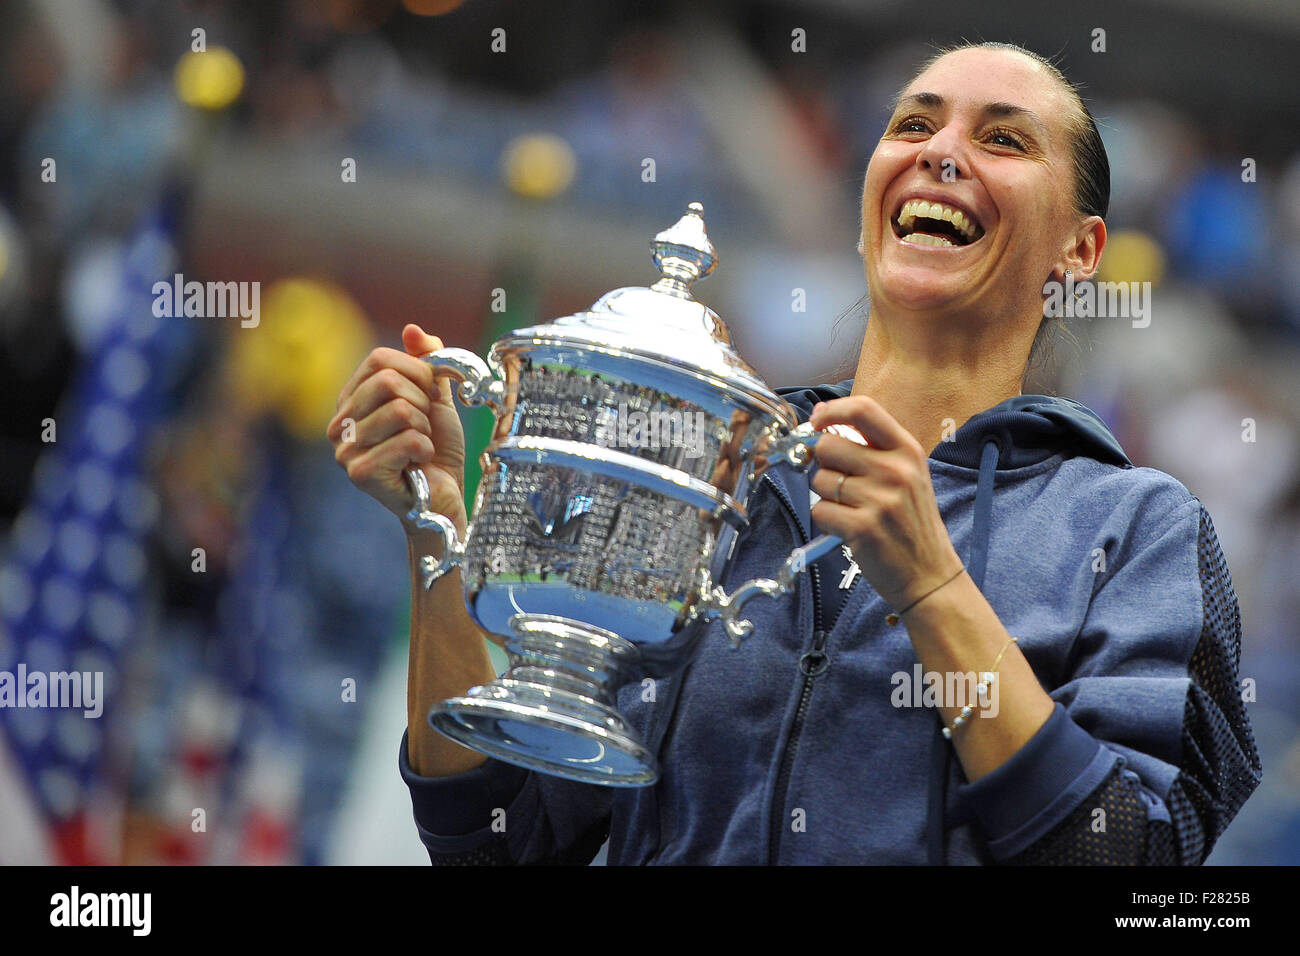 Flushing Meadows, New York, USA. 12 Sep, 2015. US Open Tennis Championships. Finale femmes. Pennetta contre Vinci. Photo Stock